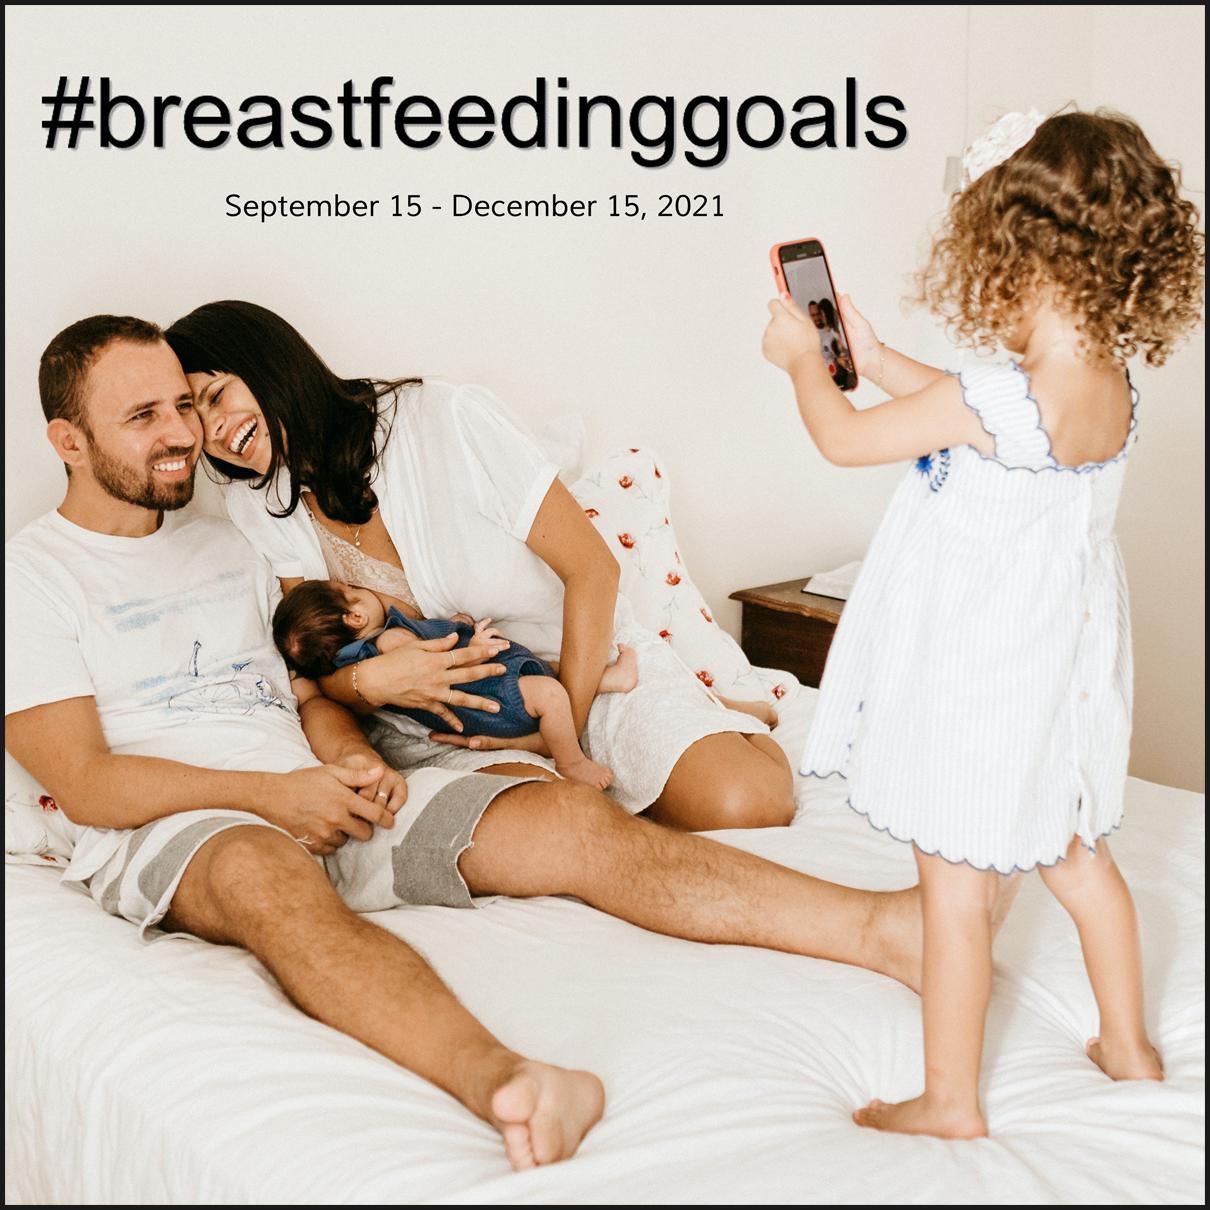 iLactation's online breastfeeding conference, #breastfeedinggoals